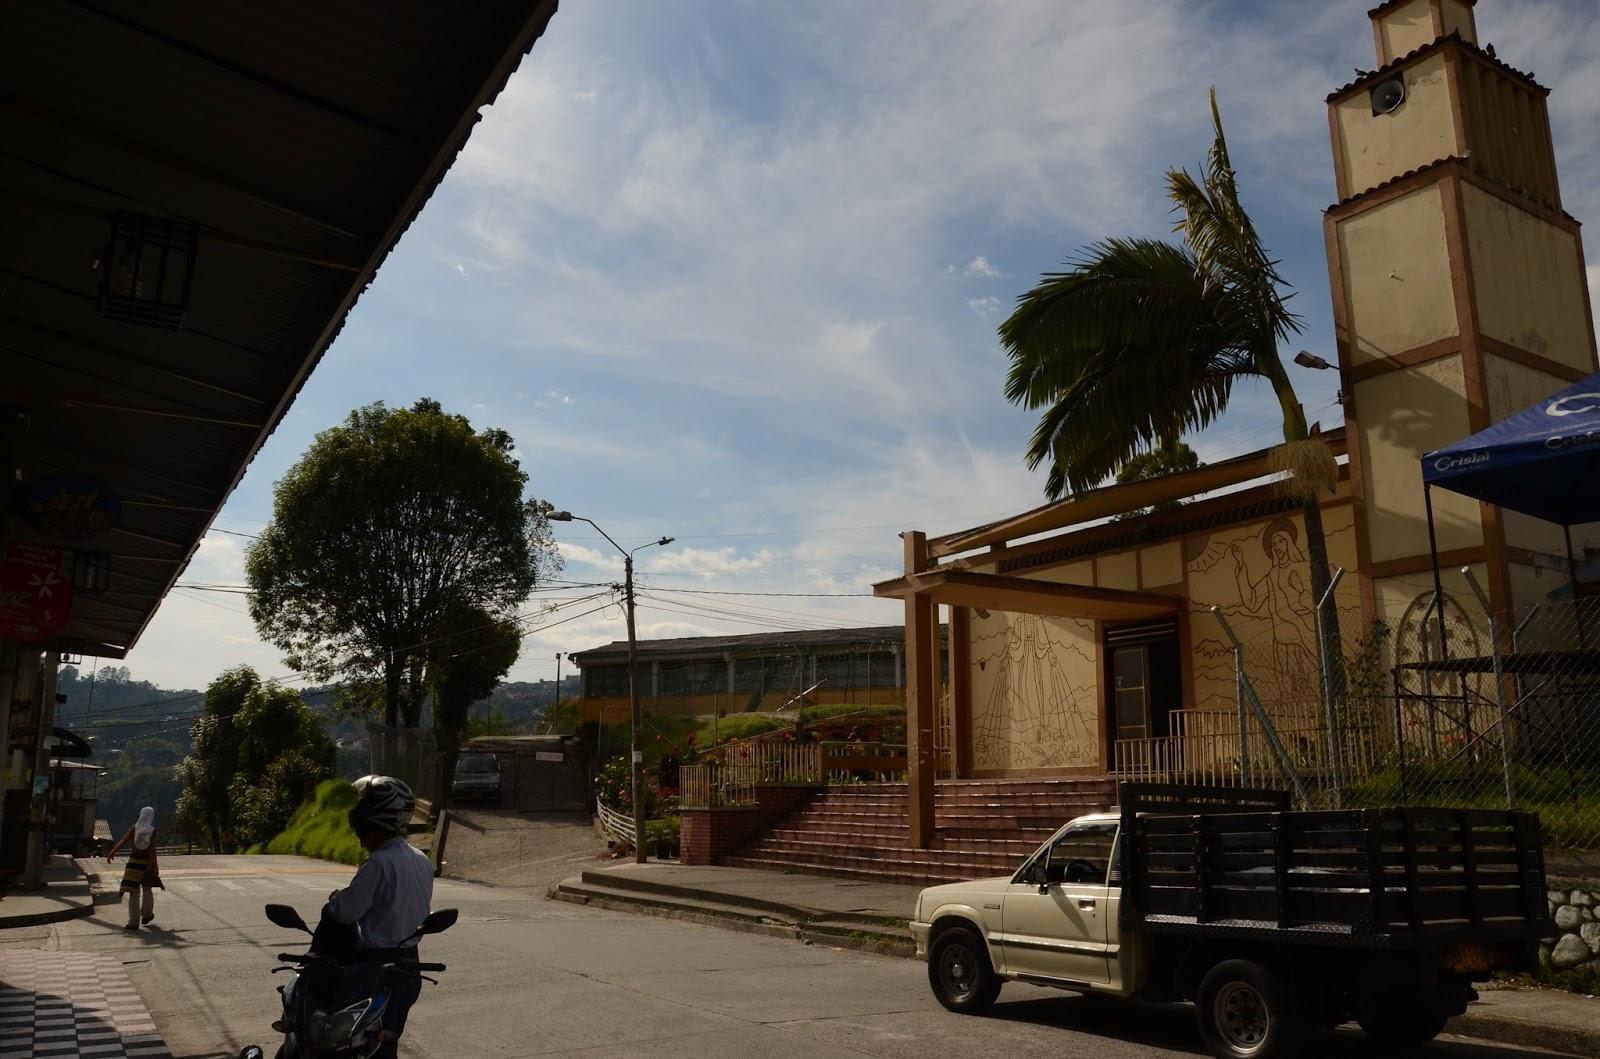 iglesia del barrio MALHABAR en manizales